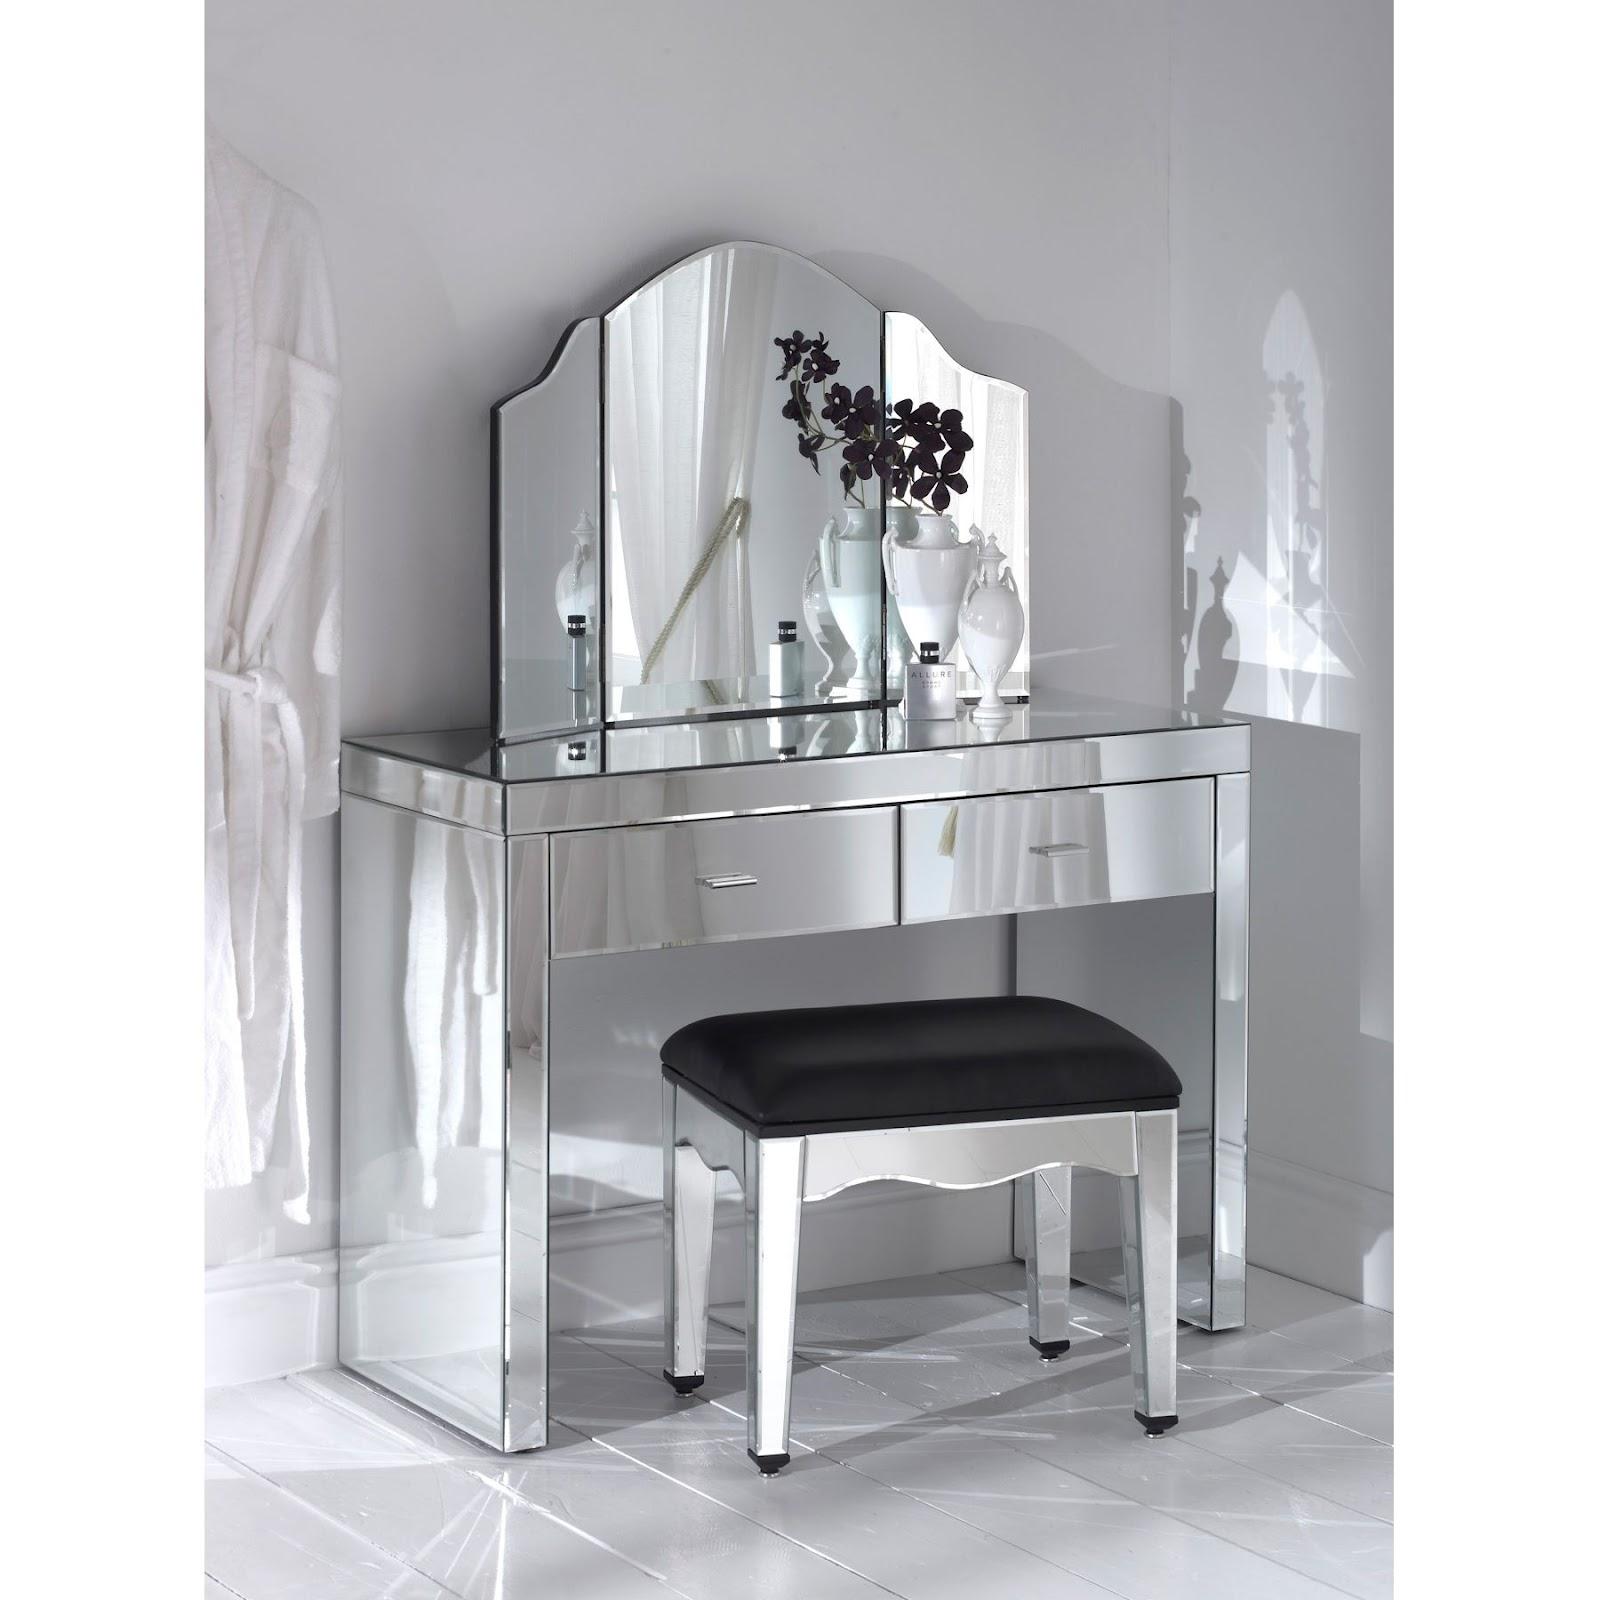 Modern dressing table furniture designs..